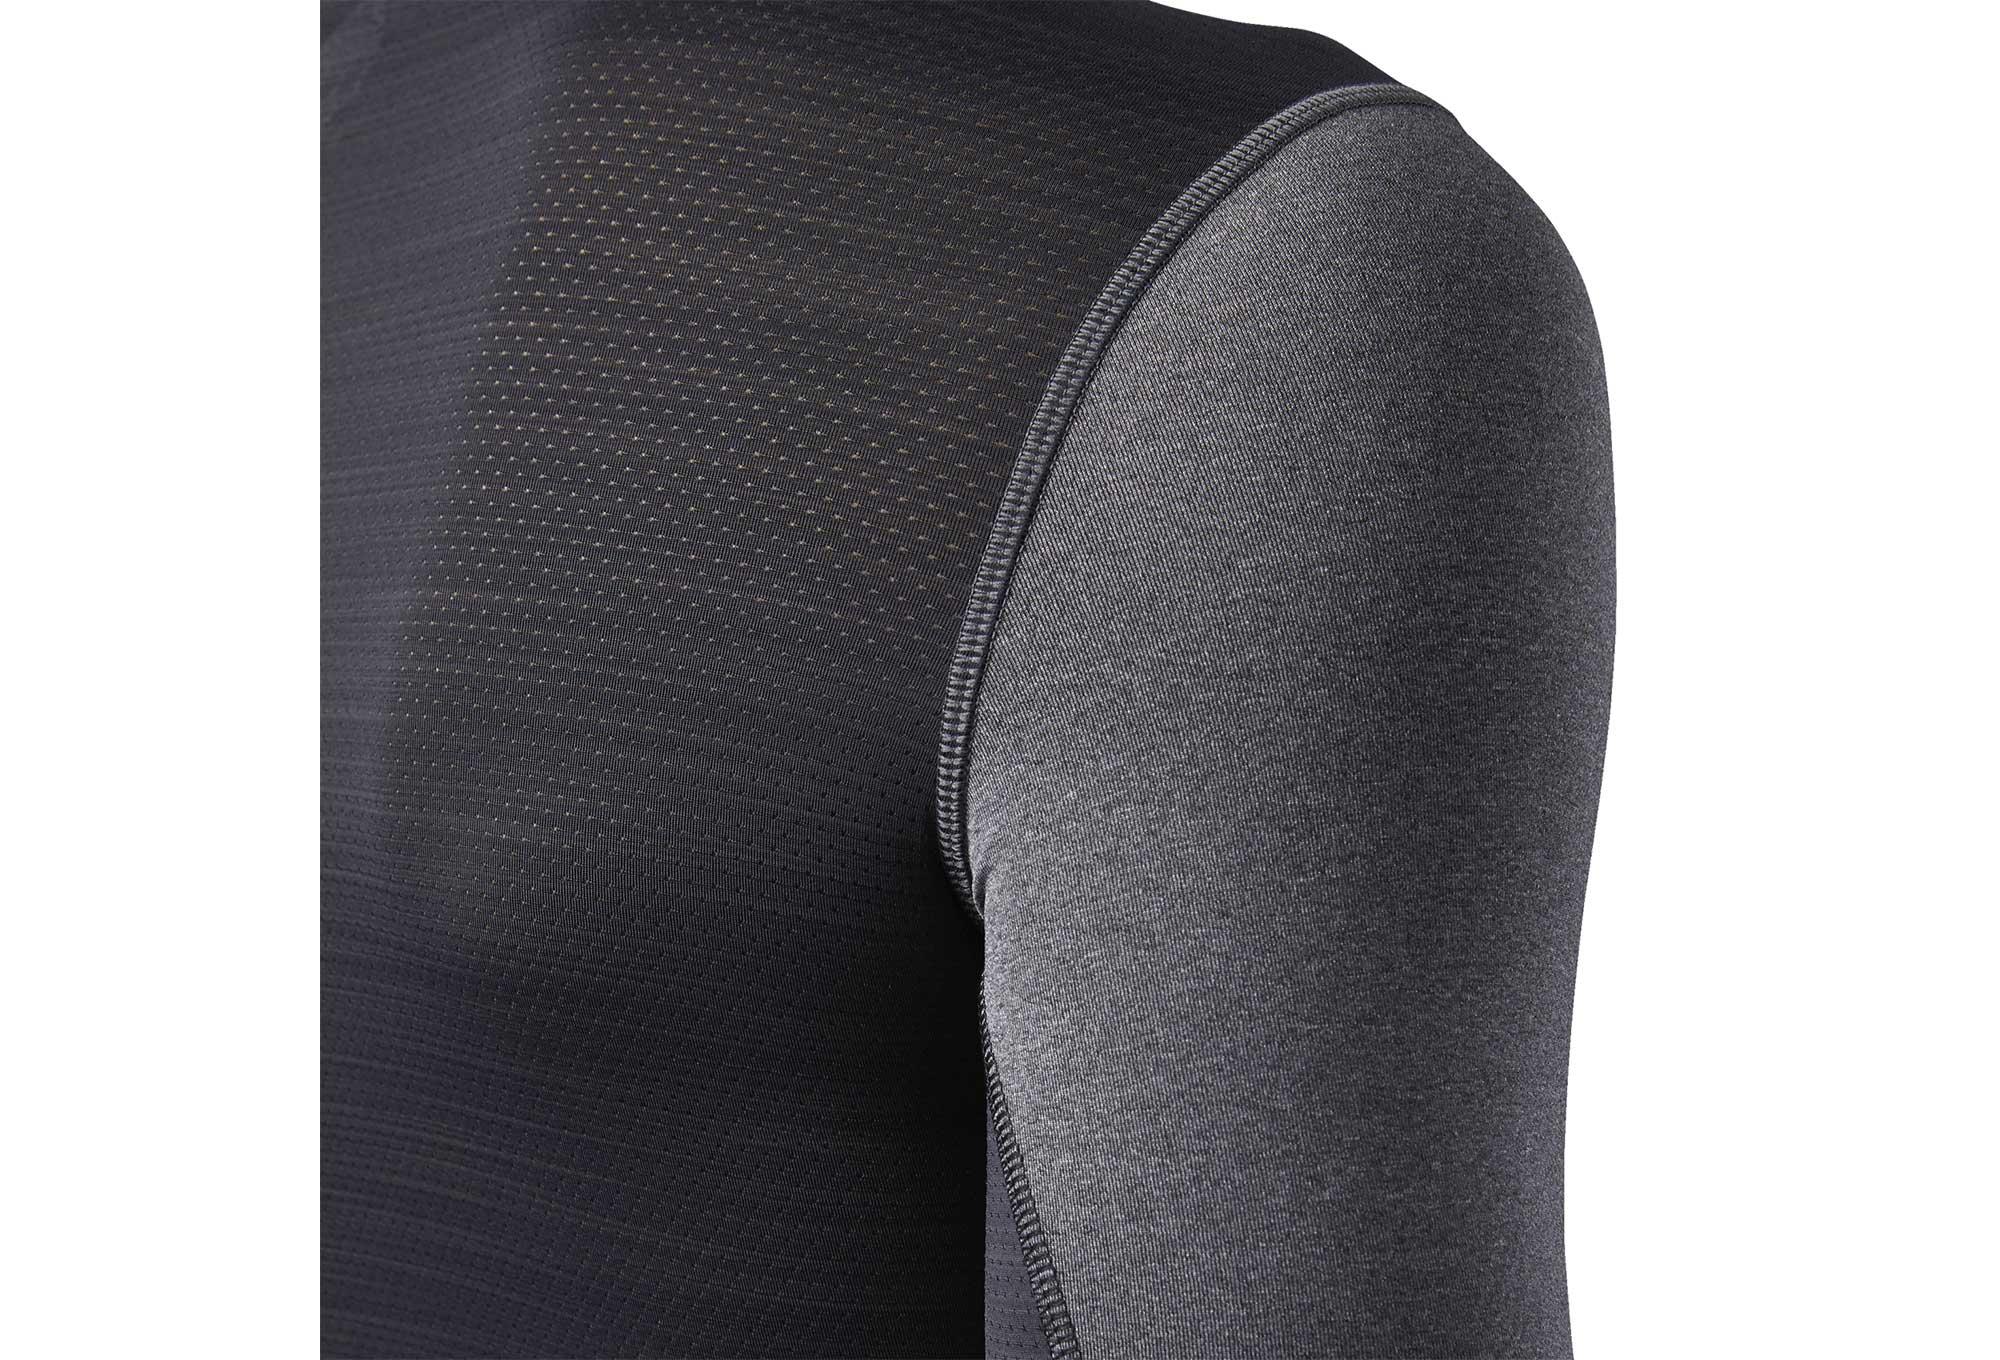 8a470ba75ca1 Reebok ACTIVChill Graphic Compression Long Sleeves Jersey Grey Black Camo